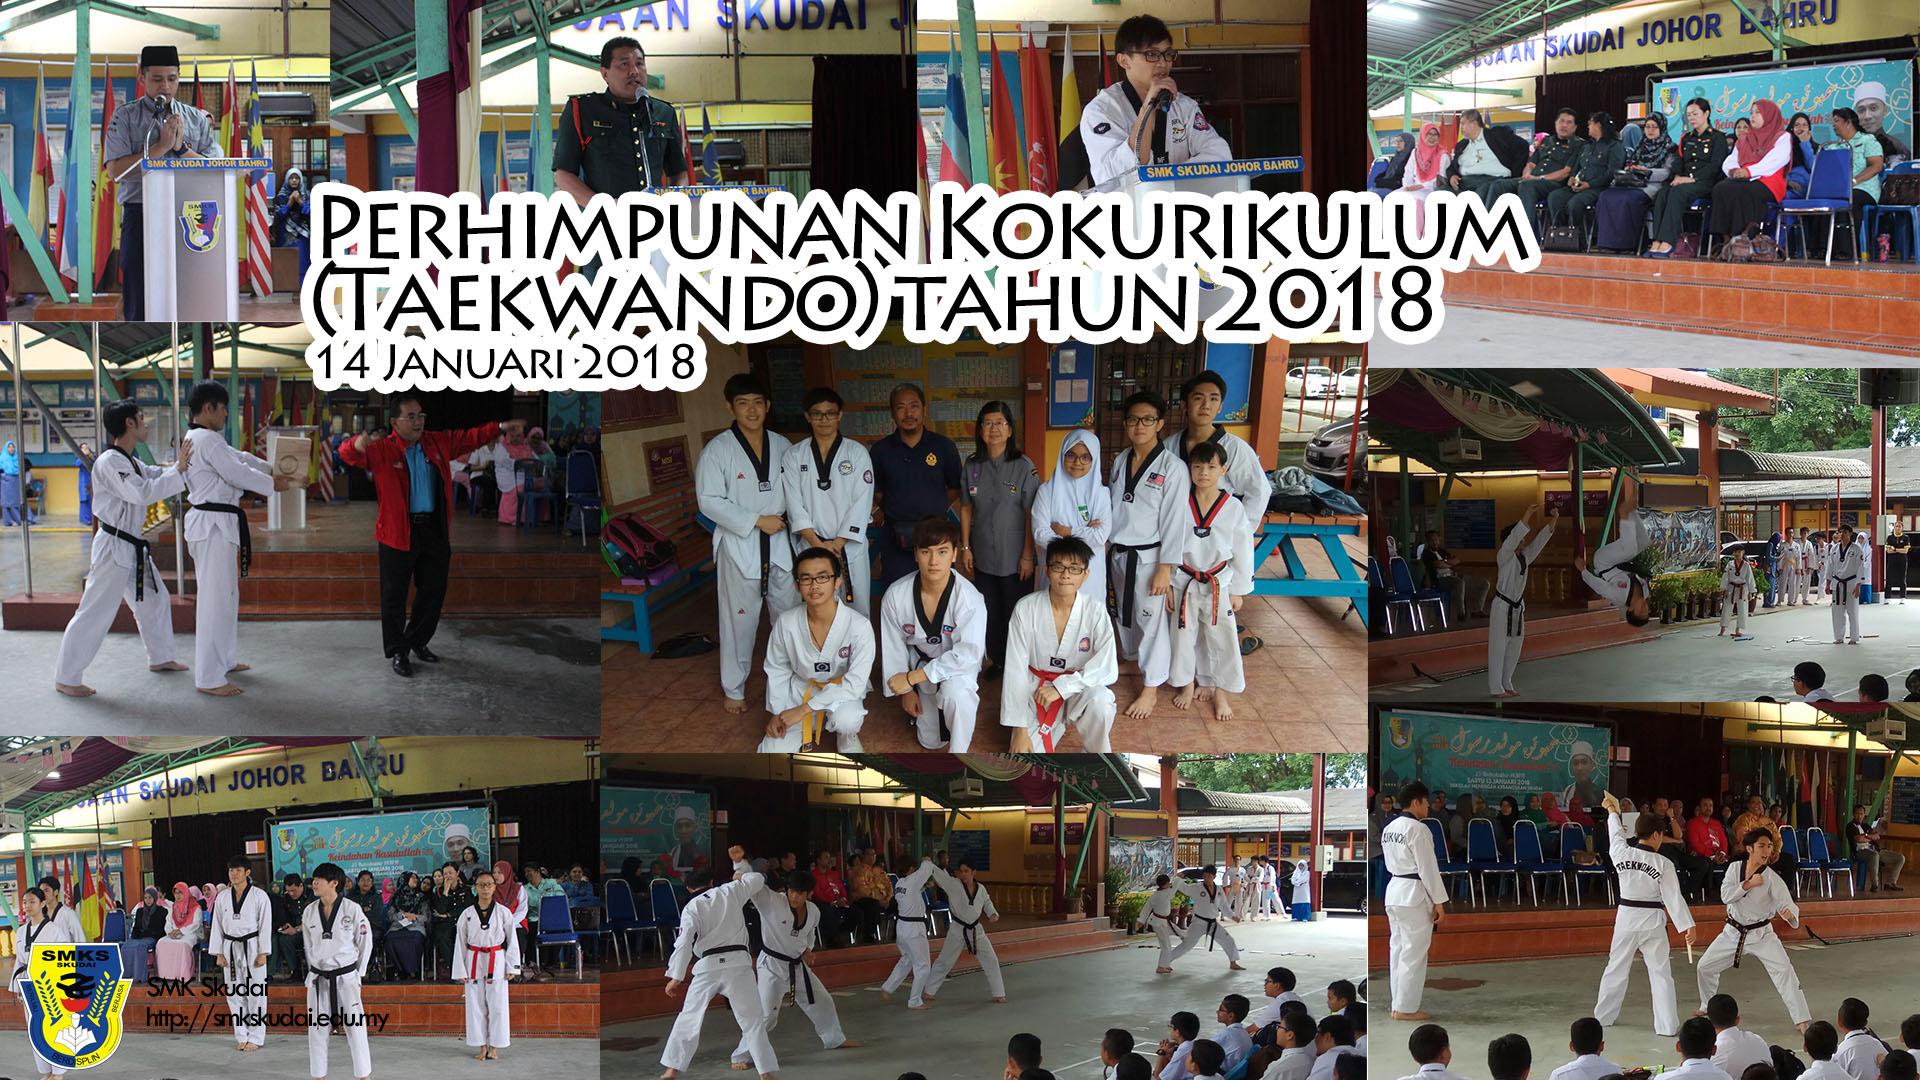 2018-01-14 Perhimpunan Kokurikulum (Taekwando)